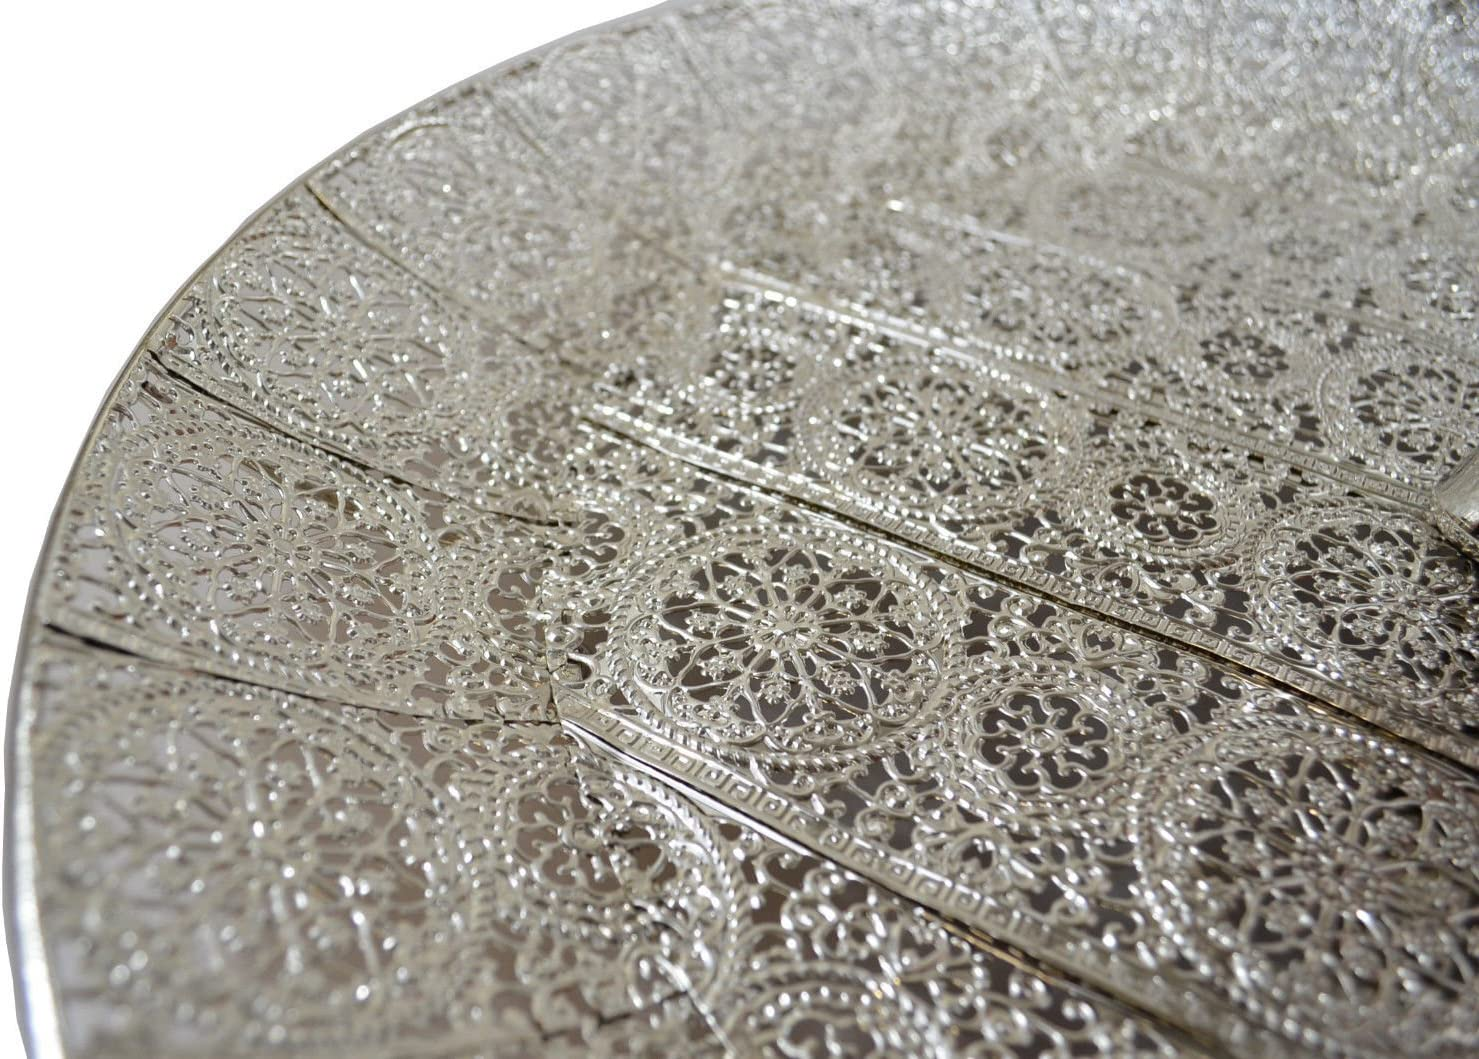 riya Etagere Glas Etagenst/änder Servierplatte Etagenplatten Etagiere 2-stufig Neu